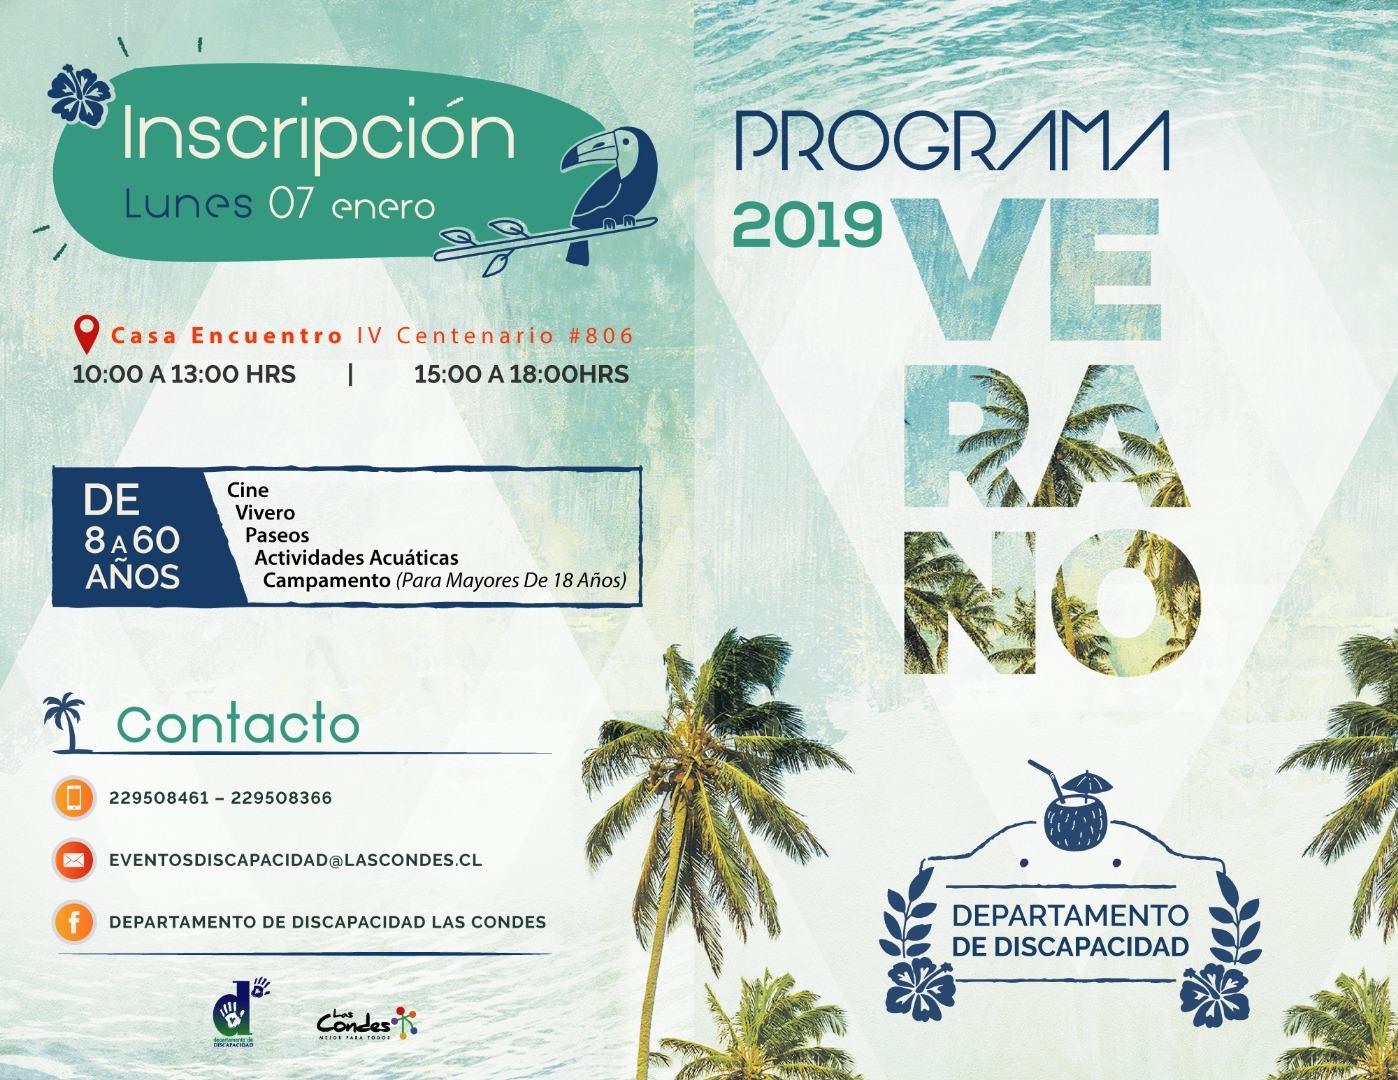 Programa verano 2019